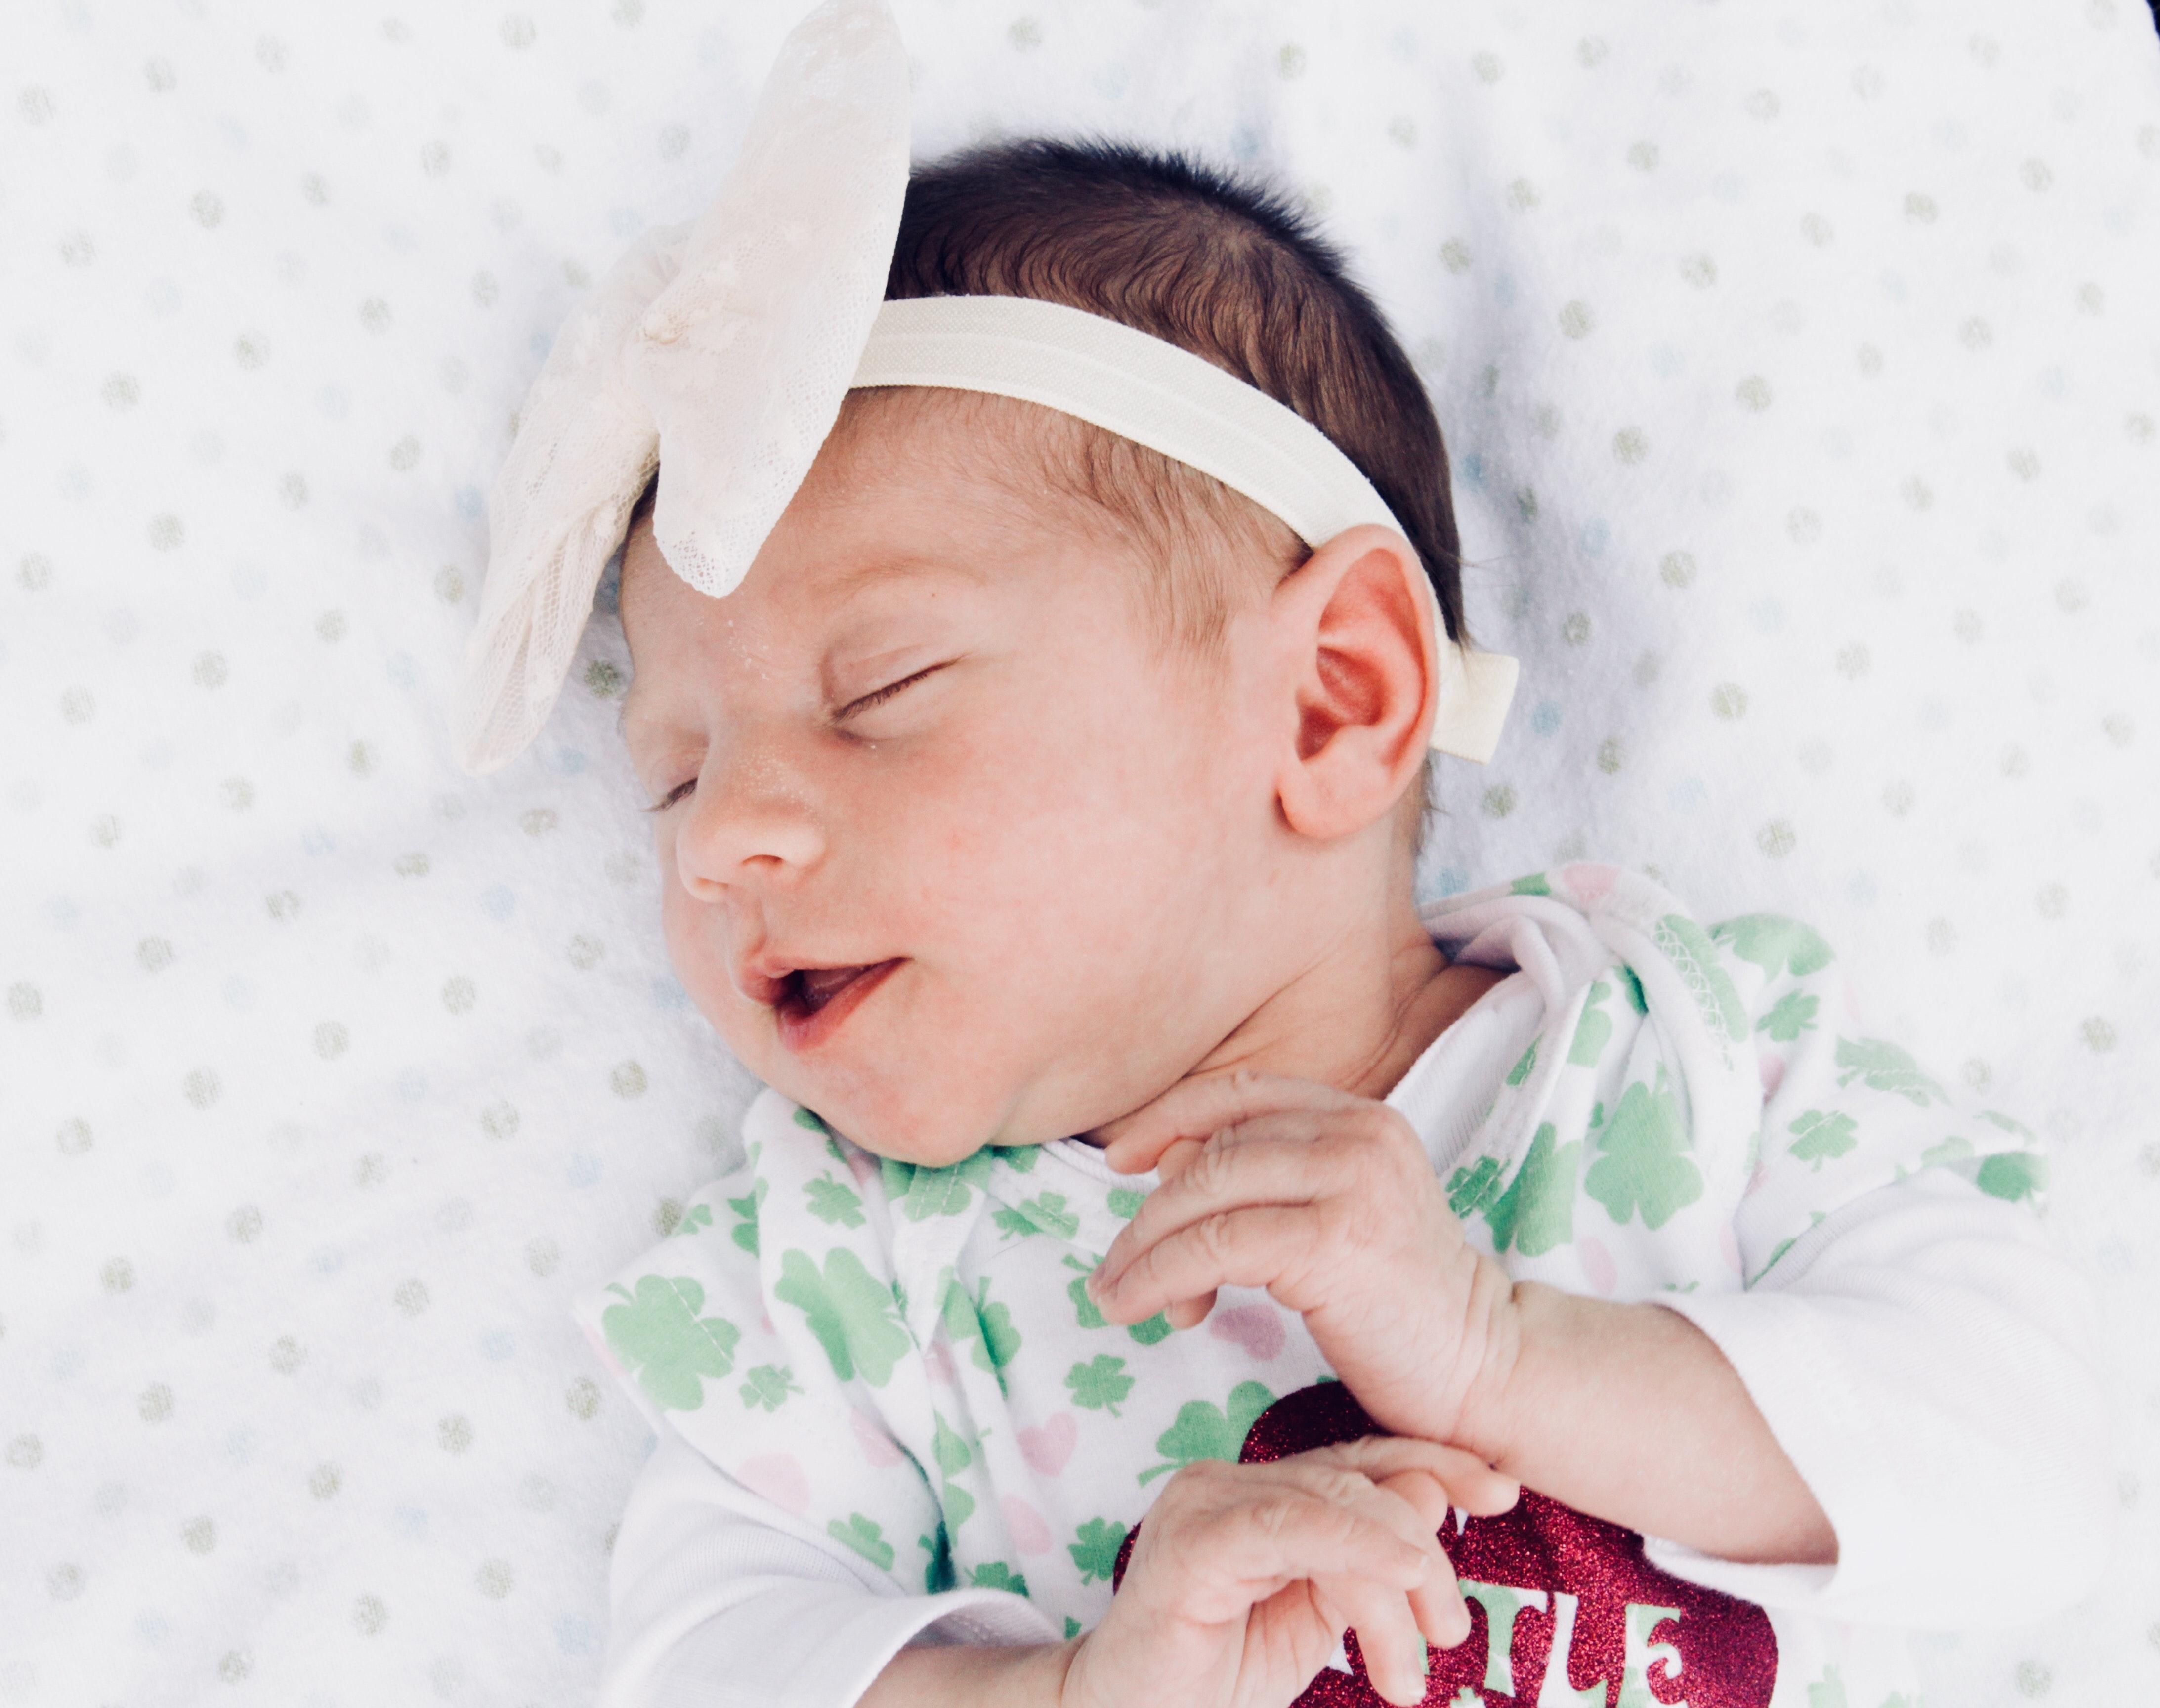 Adorable Newborn Baby Sleeping On Bed Free Stock Photo